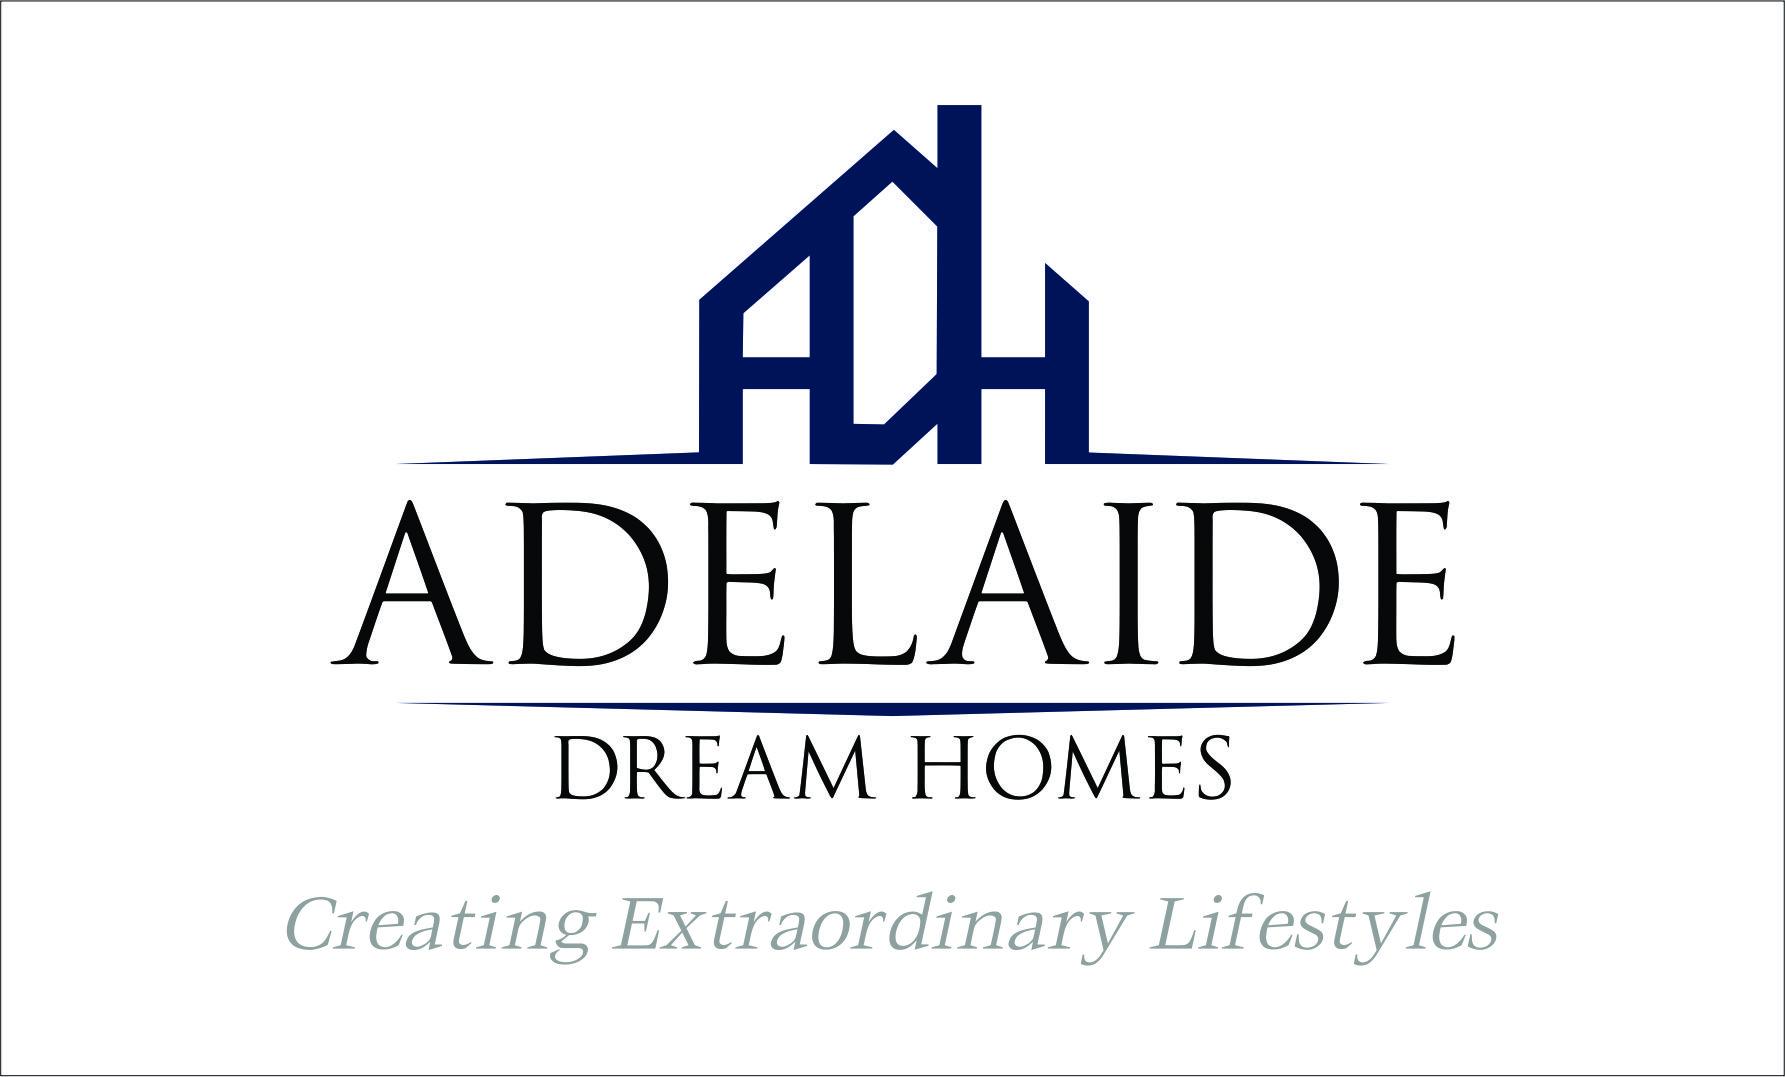 Adelaide Dream Homes